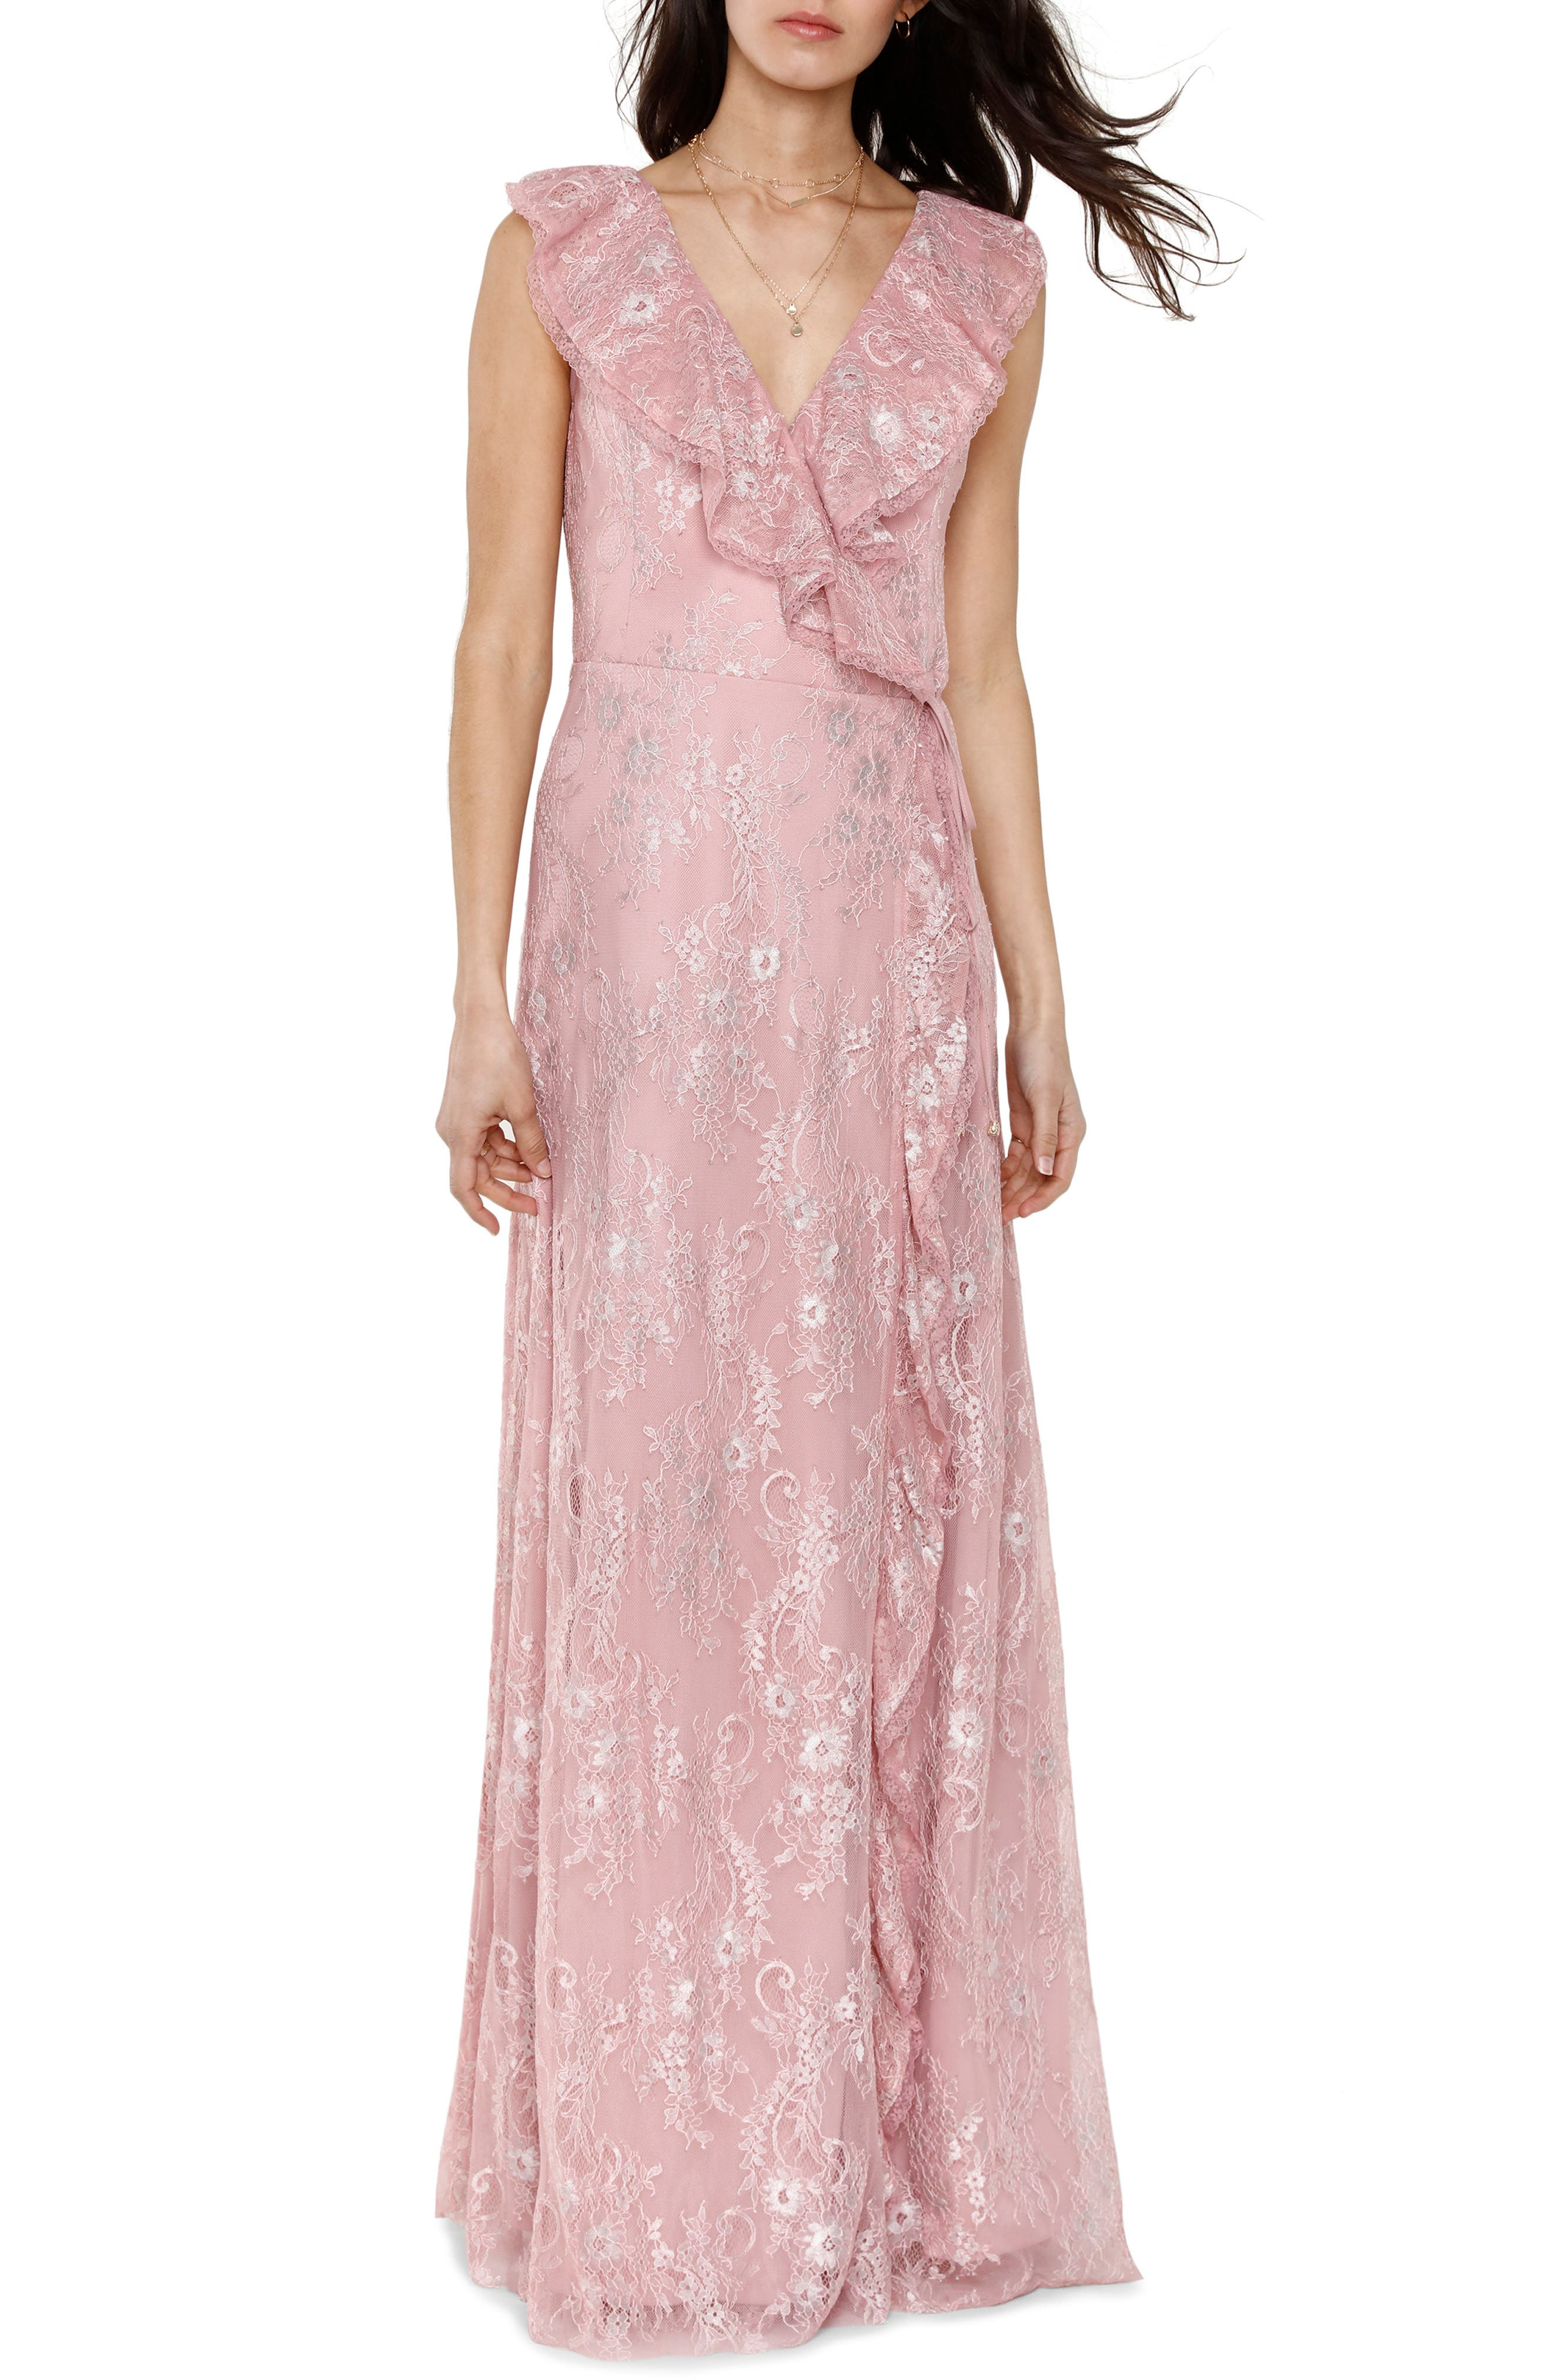 Rio Ruffle Lace Wrap Gown,                         Main,                         color, CALYPSO